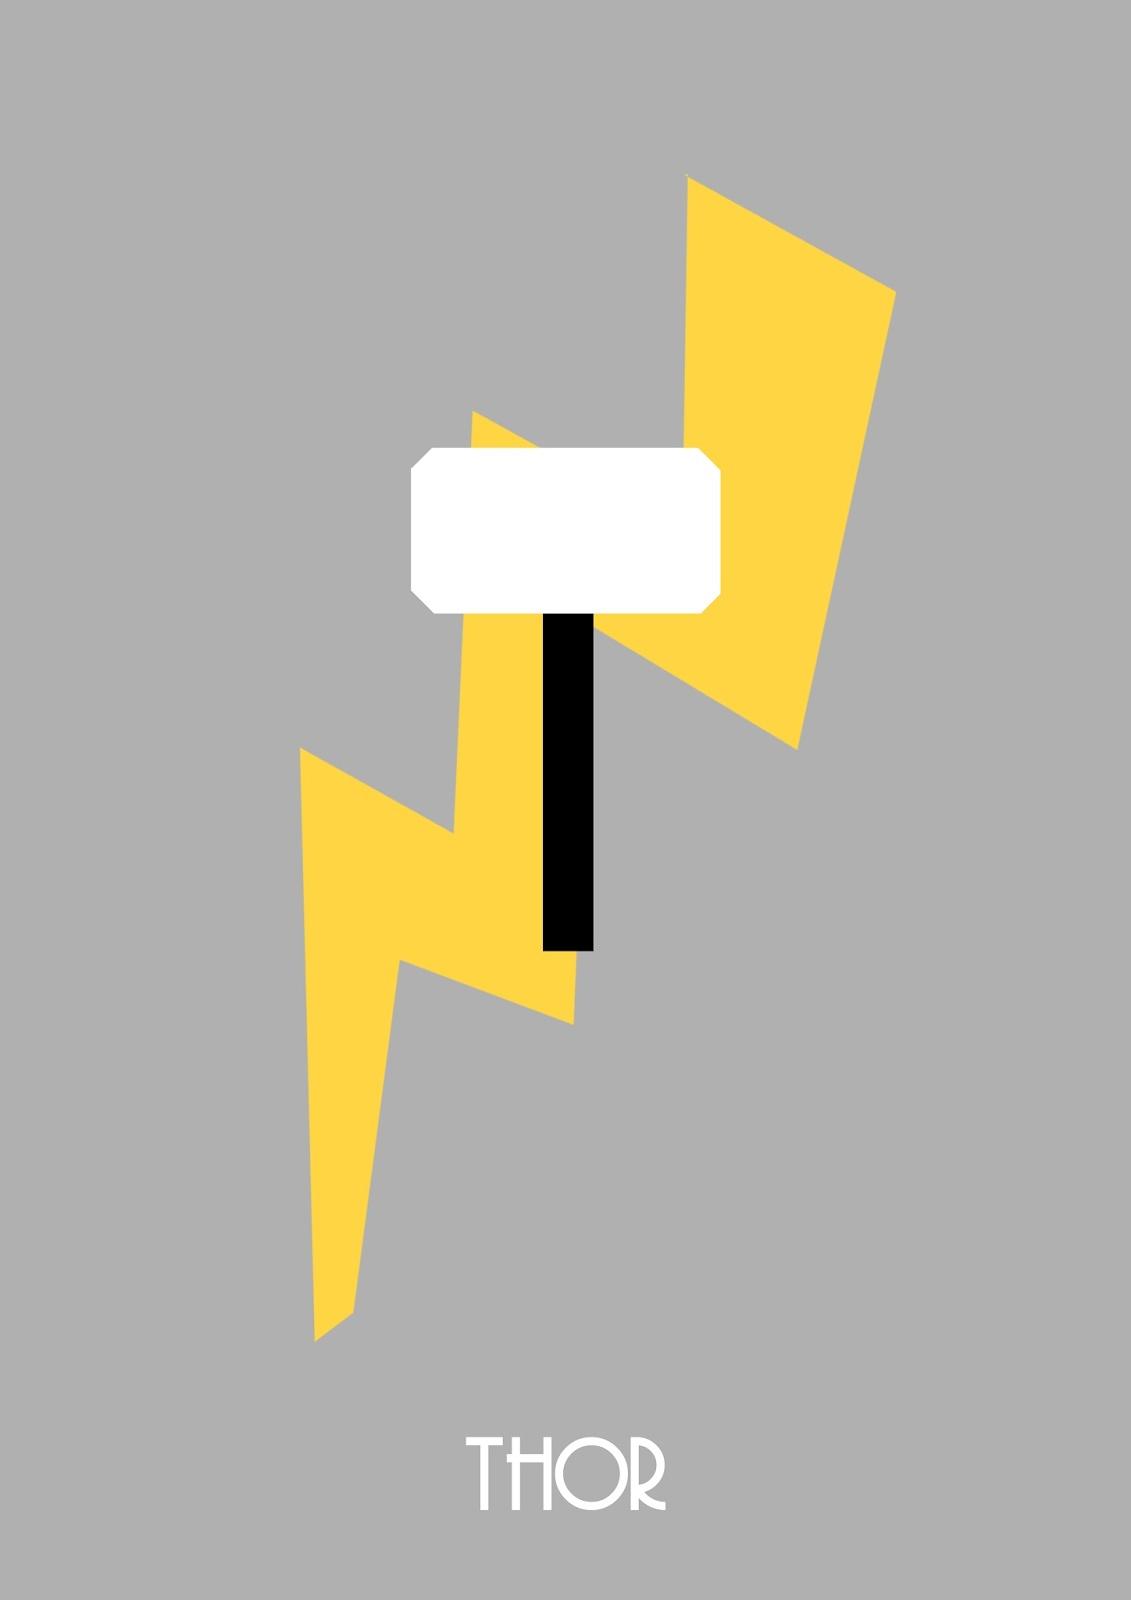 cg design thor the god of thunder